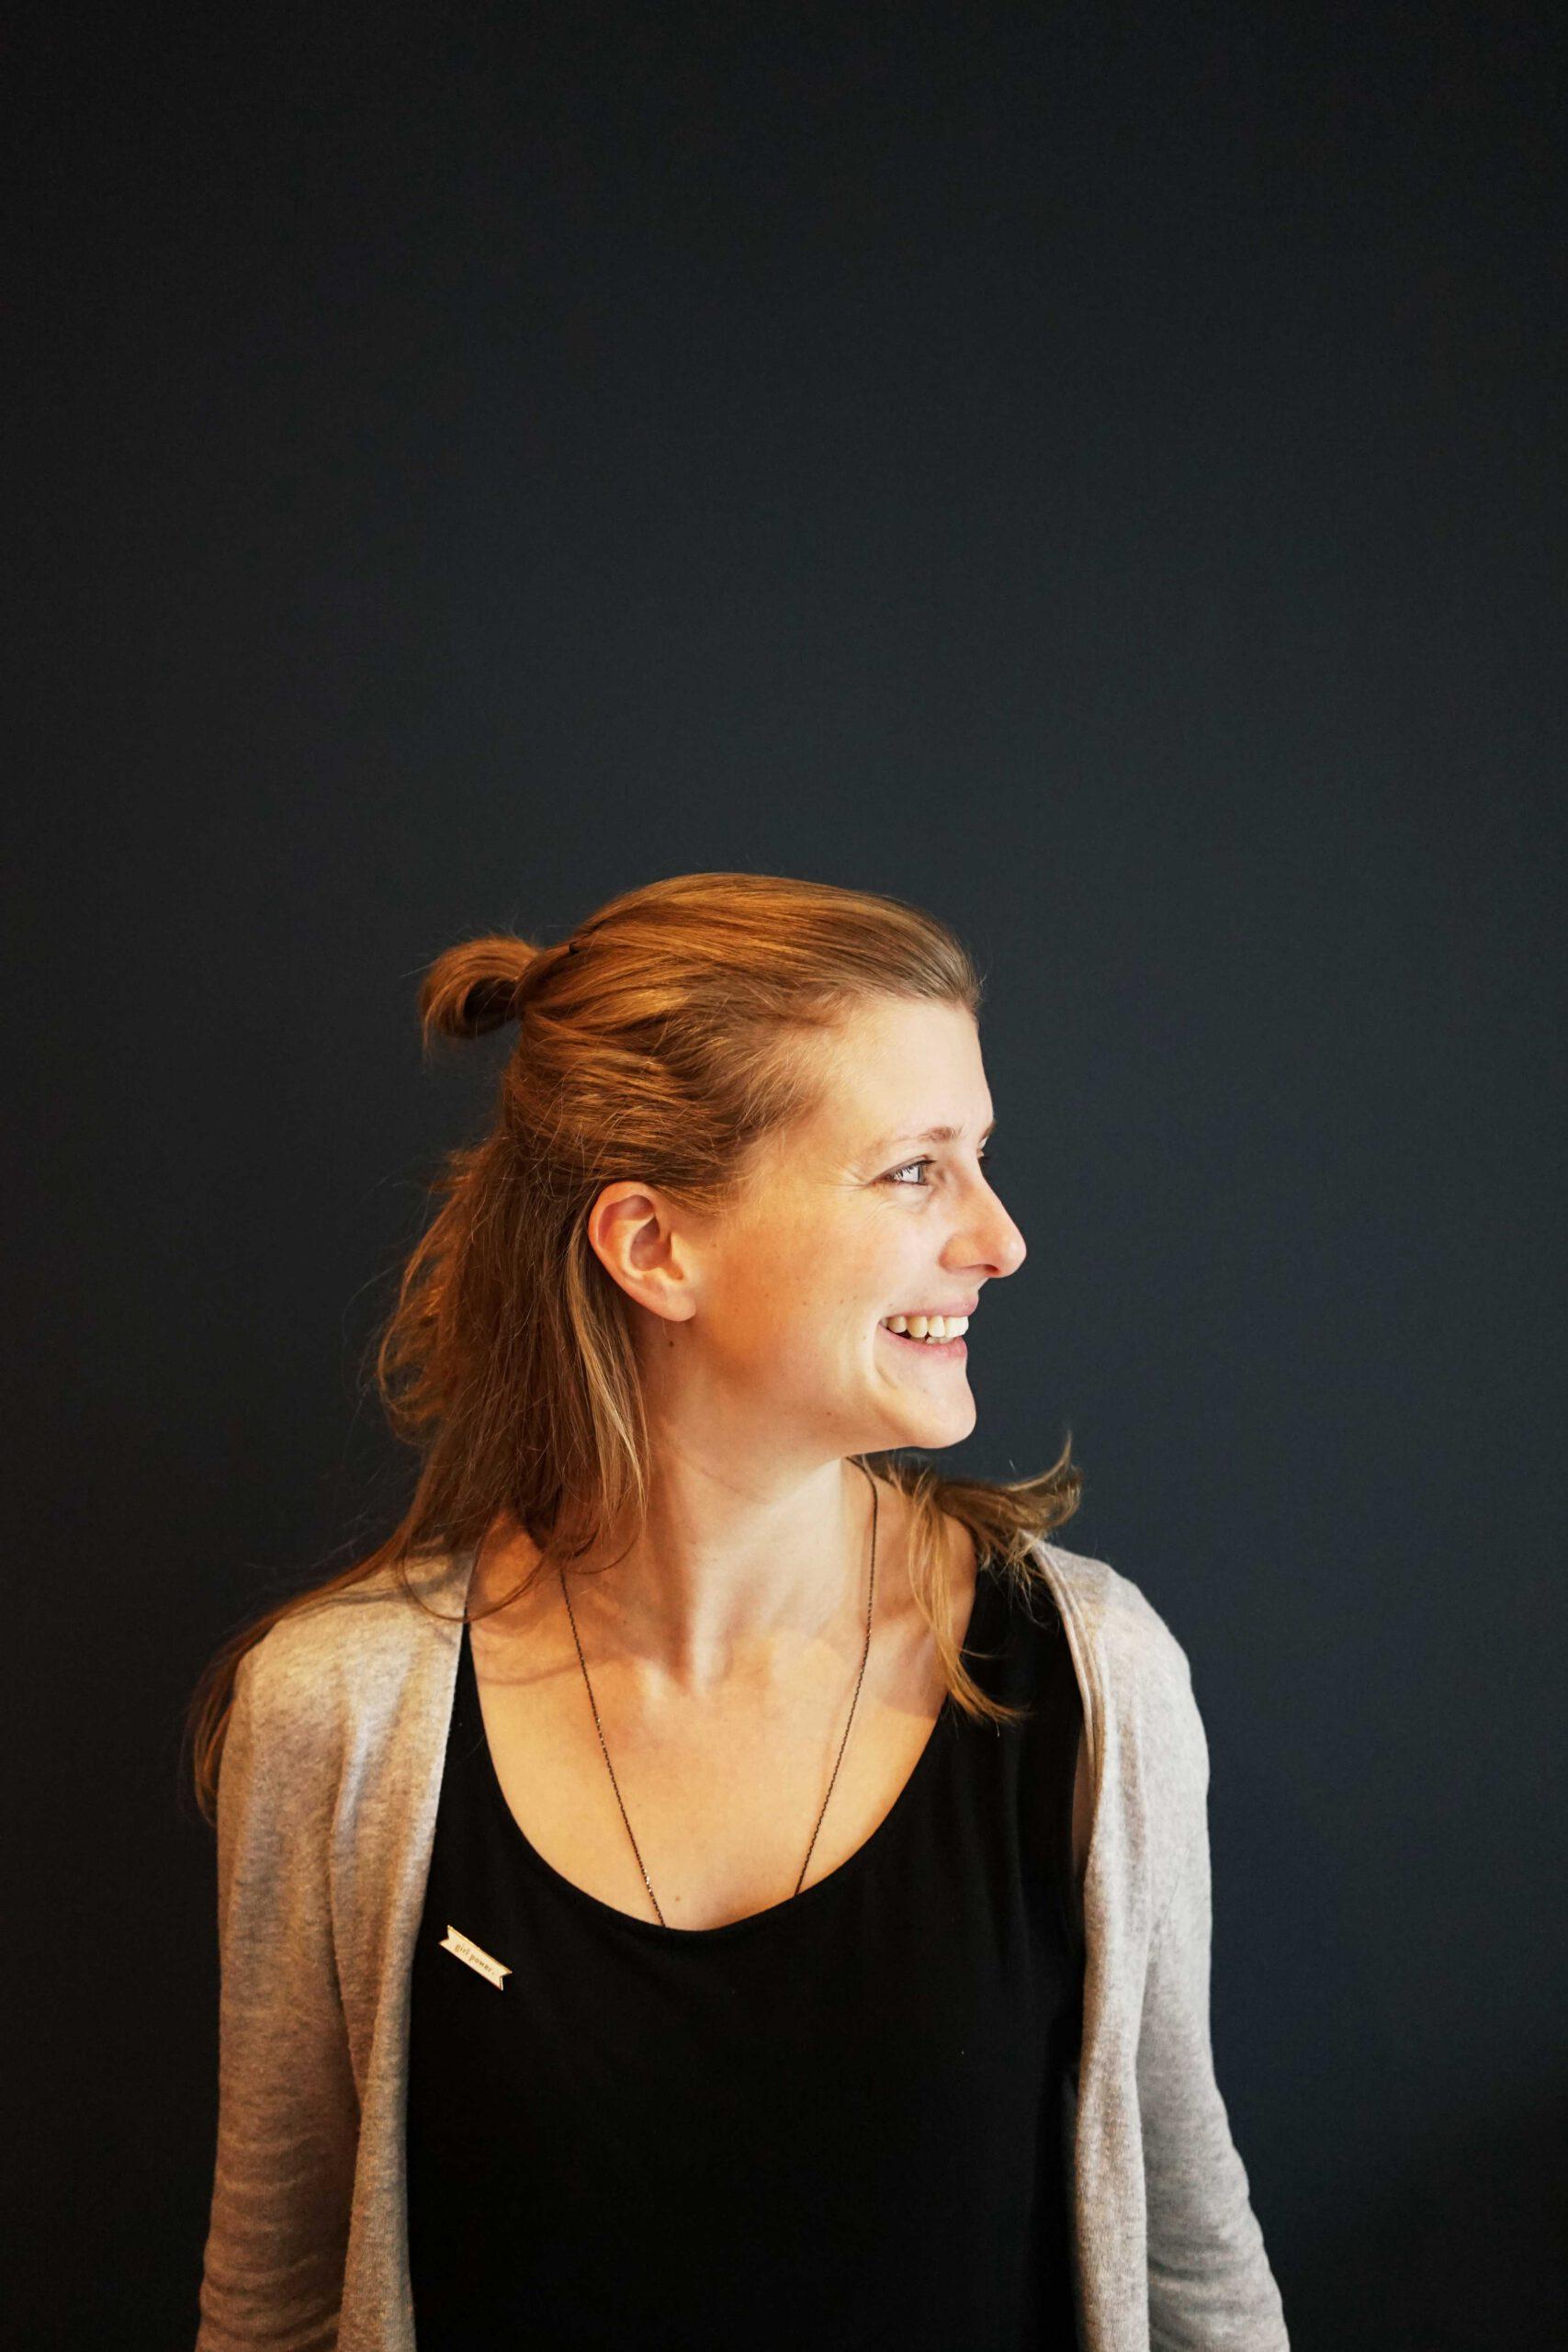 Olga Wirth